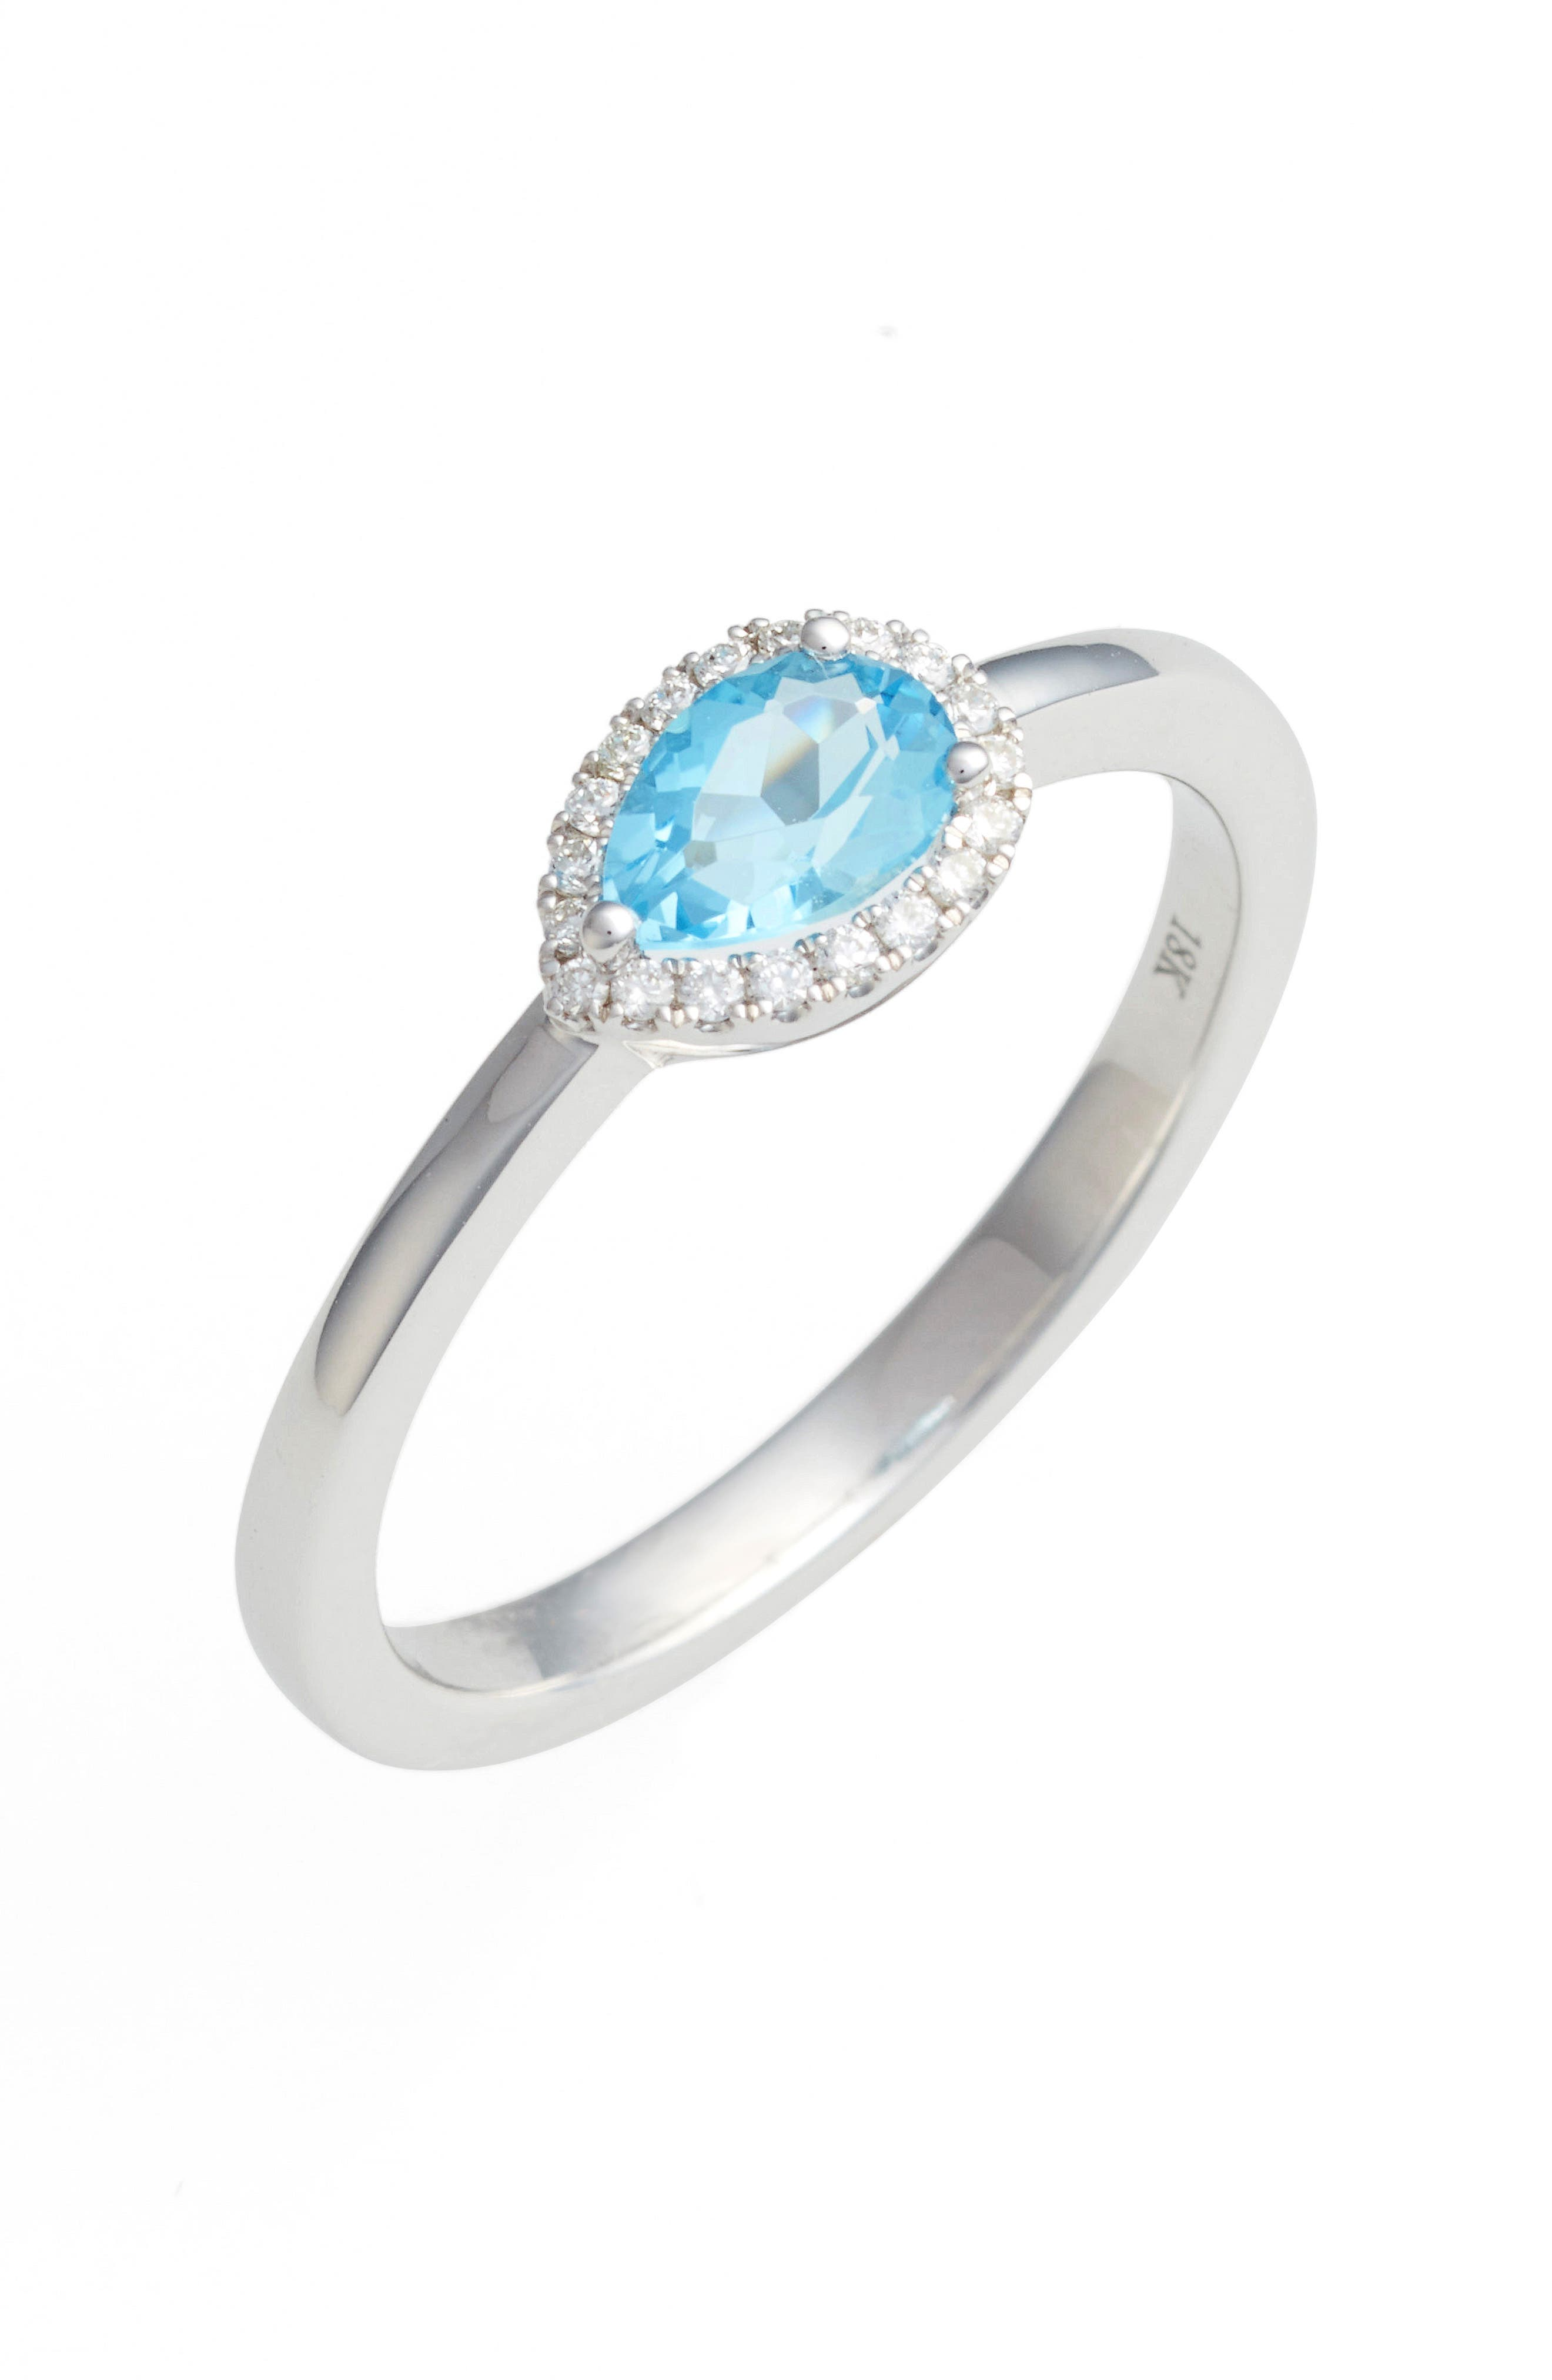 Main Image - Bony Levy Iris Diamond & Semiprecious Stone Teardrop Ring (Nordstrom Exclusive)